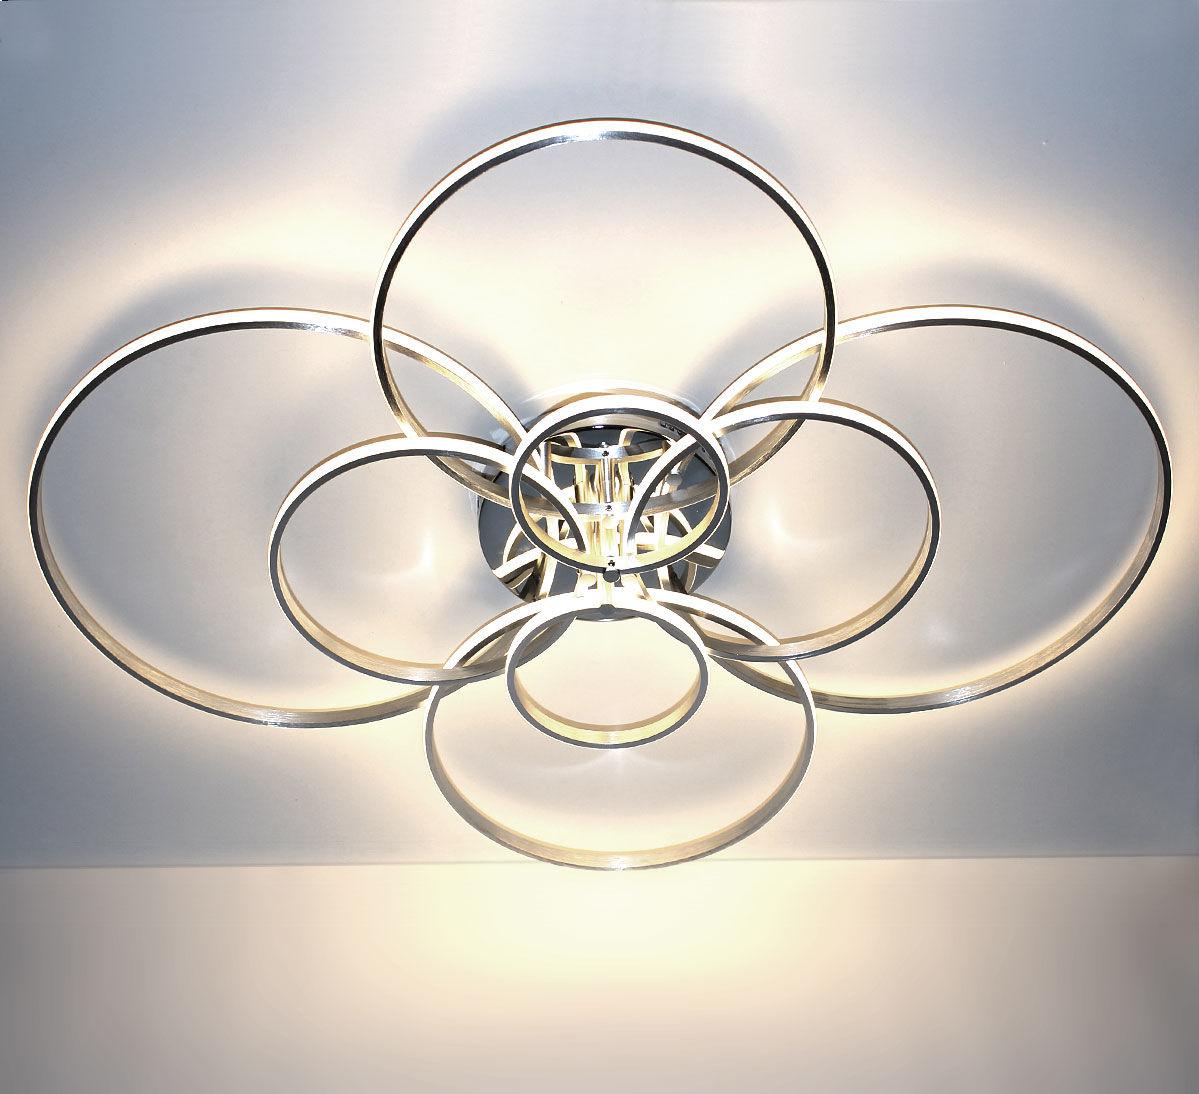 Srebrny plafon LED 110x90cm 3000K 70Watt - P141